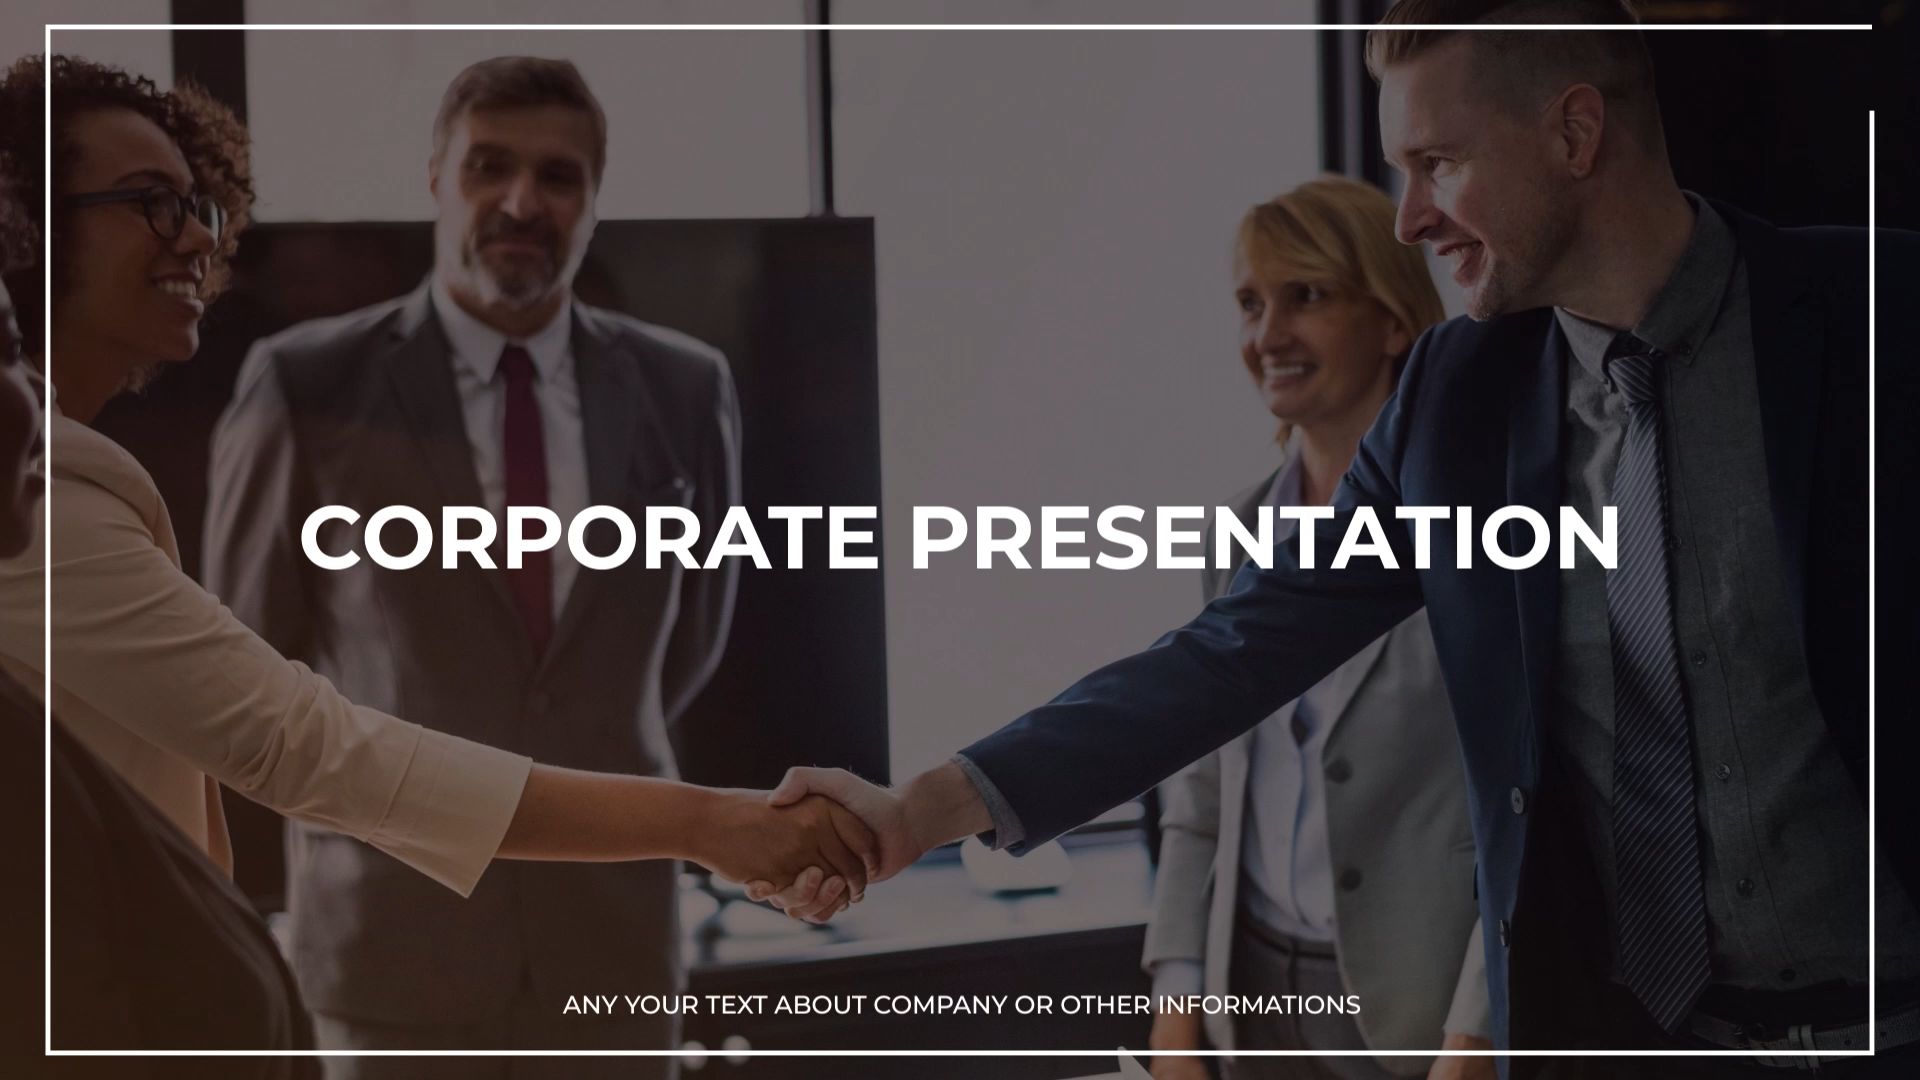 Corporate Presentation & Slideshow - 3